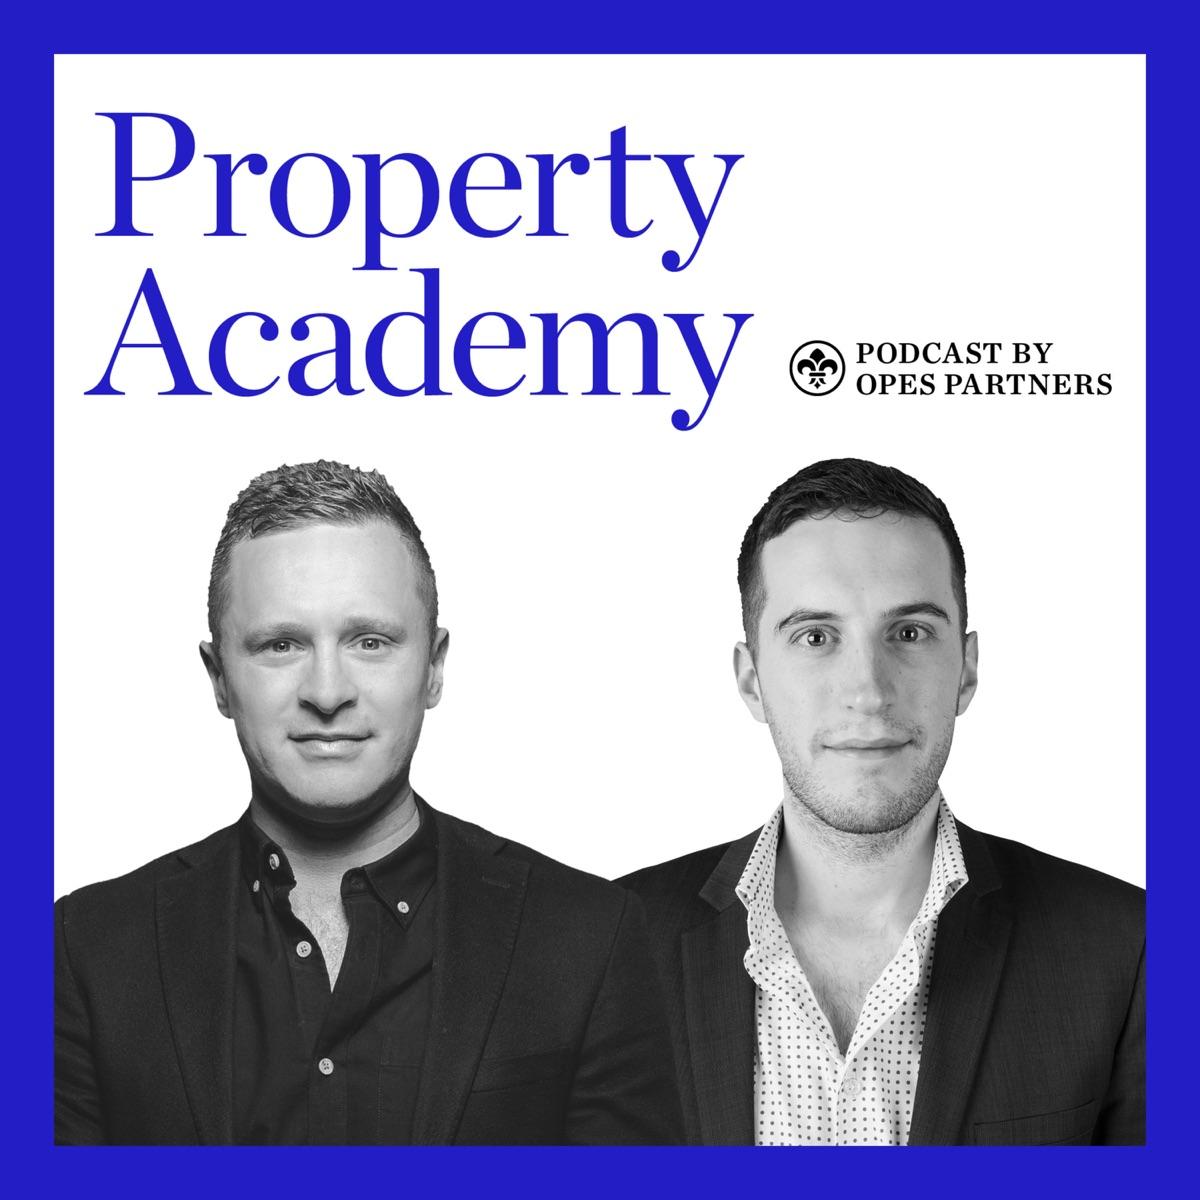 The Property Academy Podcast